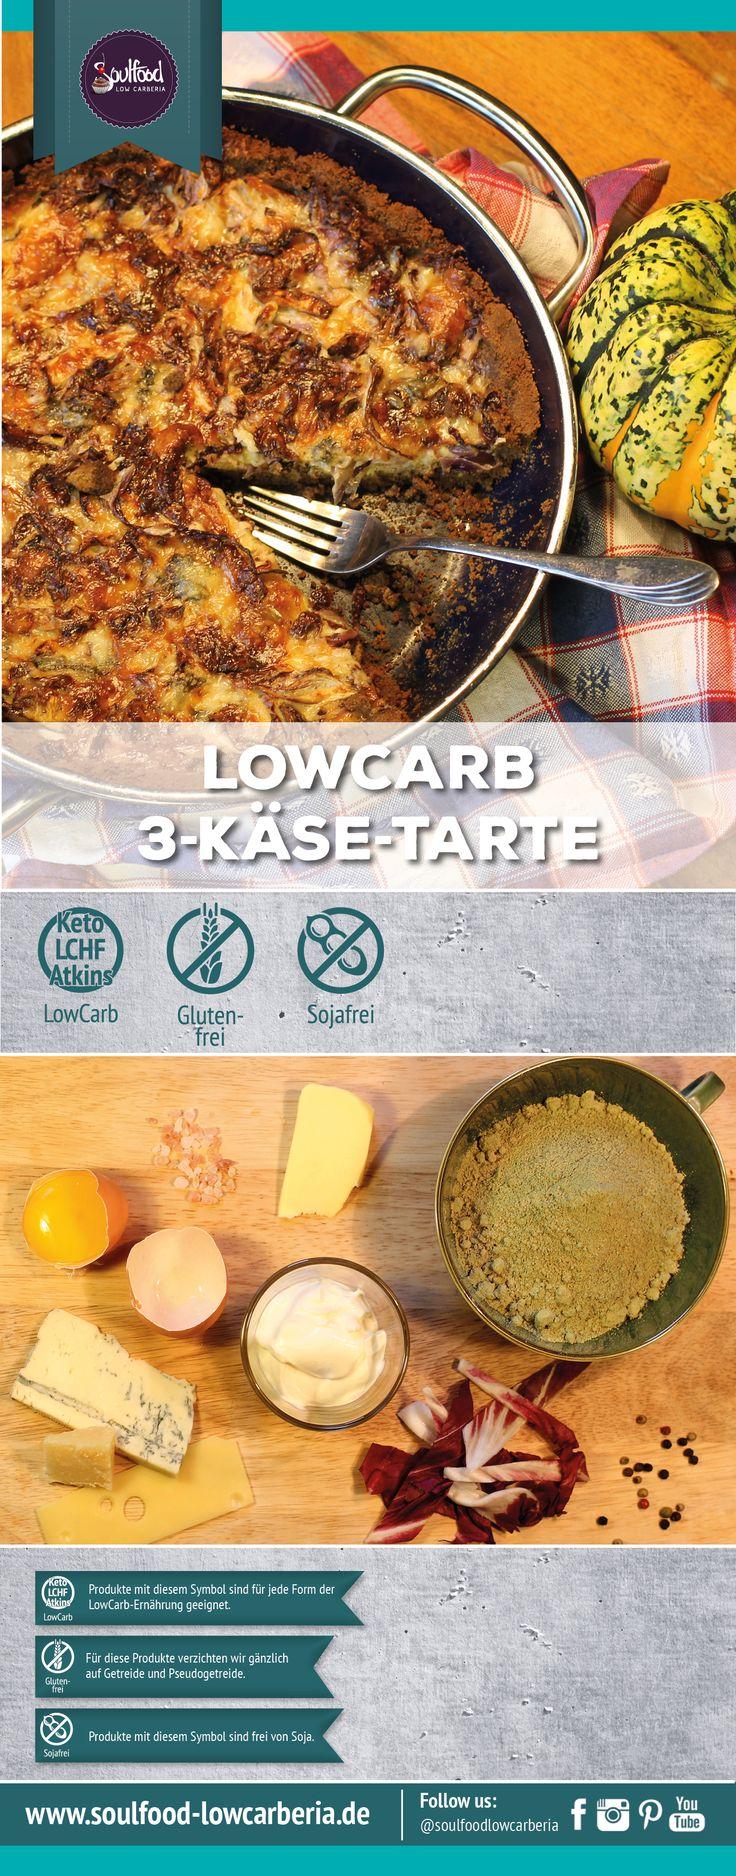 Leckere Tarte mit #Emmentaler, #Gorgonzola und #Parmesan auf einem deftigen #Mürbteig aus #Kürbiskernmehl. Delicious Tarte with Emmentaler, Parmesan and #Bluecheese combinated with a pumpkinseed-flour shortcrust. #pumpkin #soulfoodlowcarberia #lowcarb #healthy #atkins #LCHF #Logi #lowcarbdiet #realfood #zuckerfrei #glutenfrei #glutenfree #sugarfree #soulfoodlowcarberiafoodblog #foodporn #keto #ketogenic #diet #abnehmen #lowcarbhighfat #cleaneating #nosugar #flourless #grainfree #foodblog…